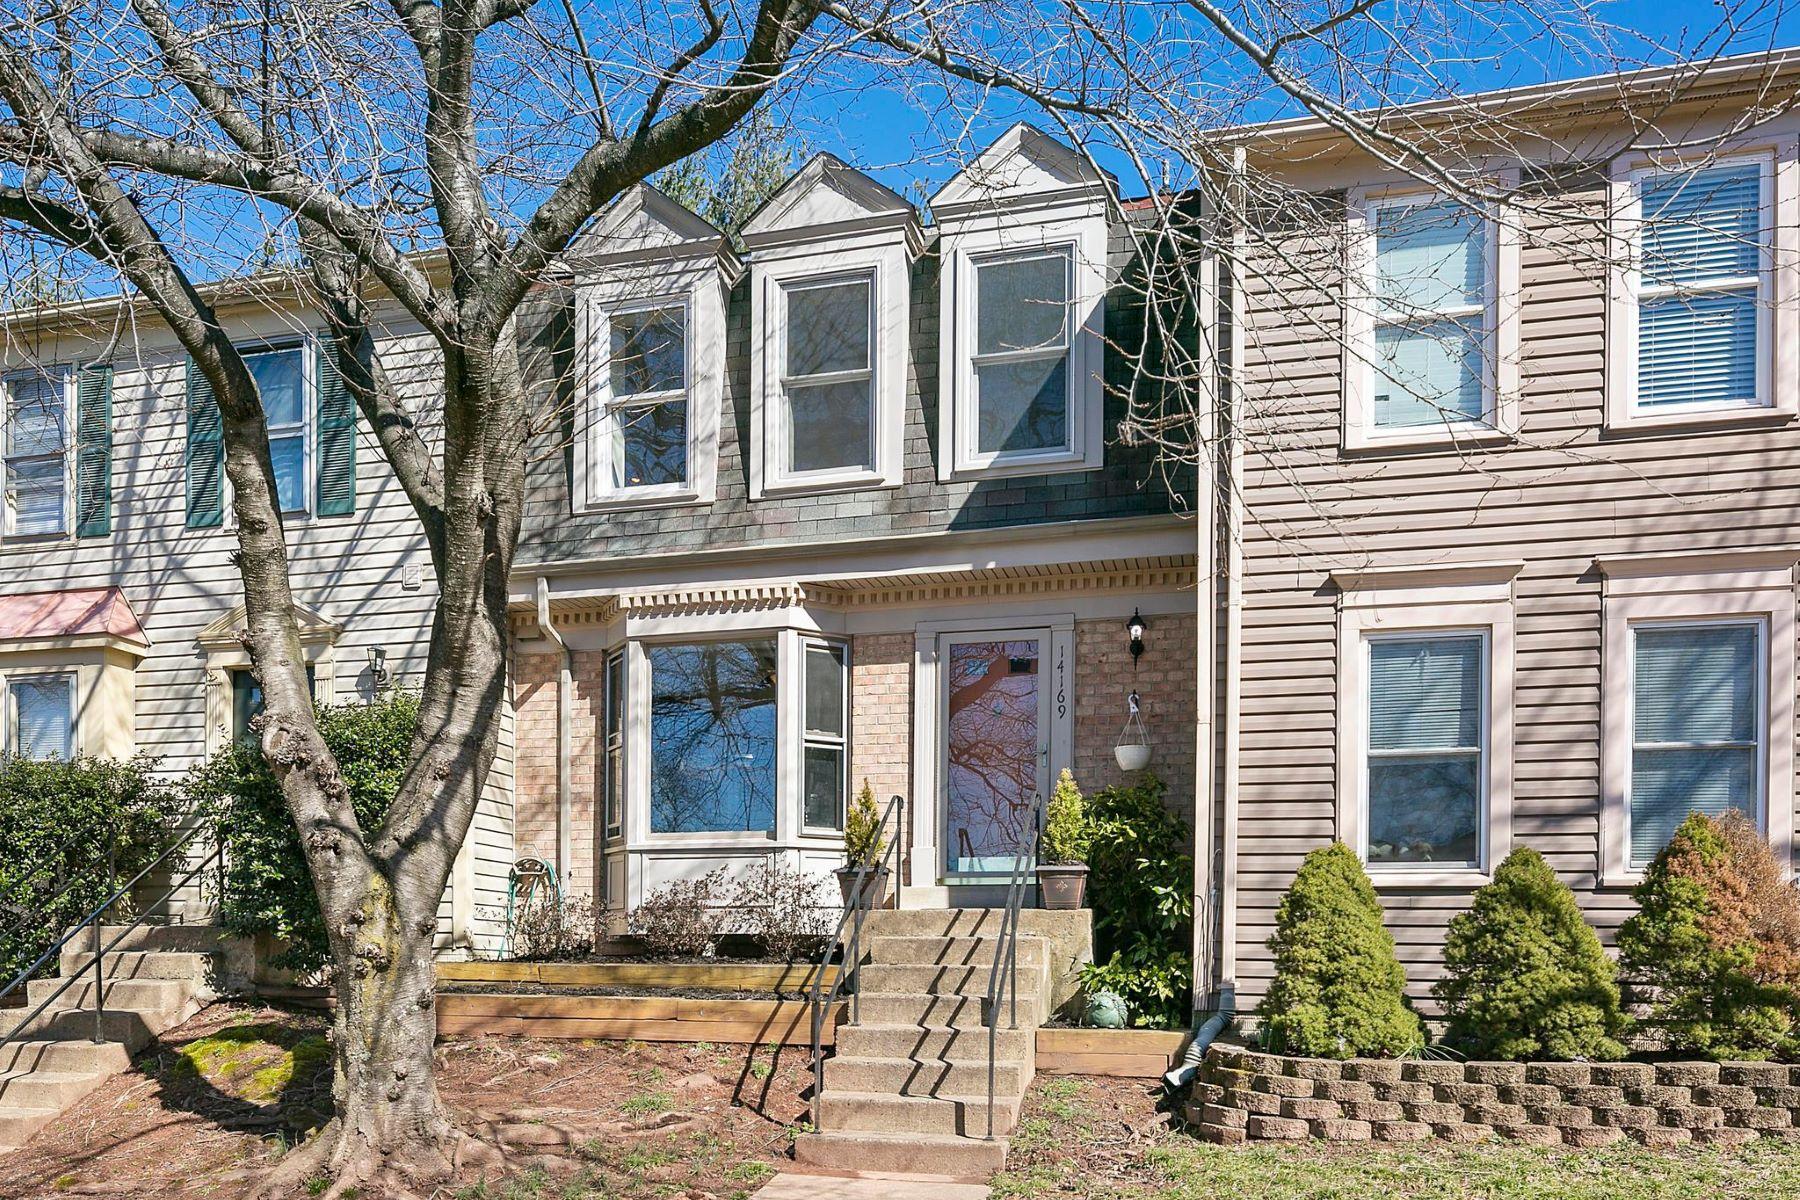 Townhouse for Sale at 14169 Royal Oak Ln 14169 Royal Oak Ln Centreville, Virginia 20120 United States